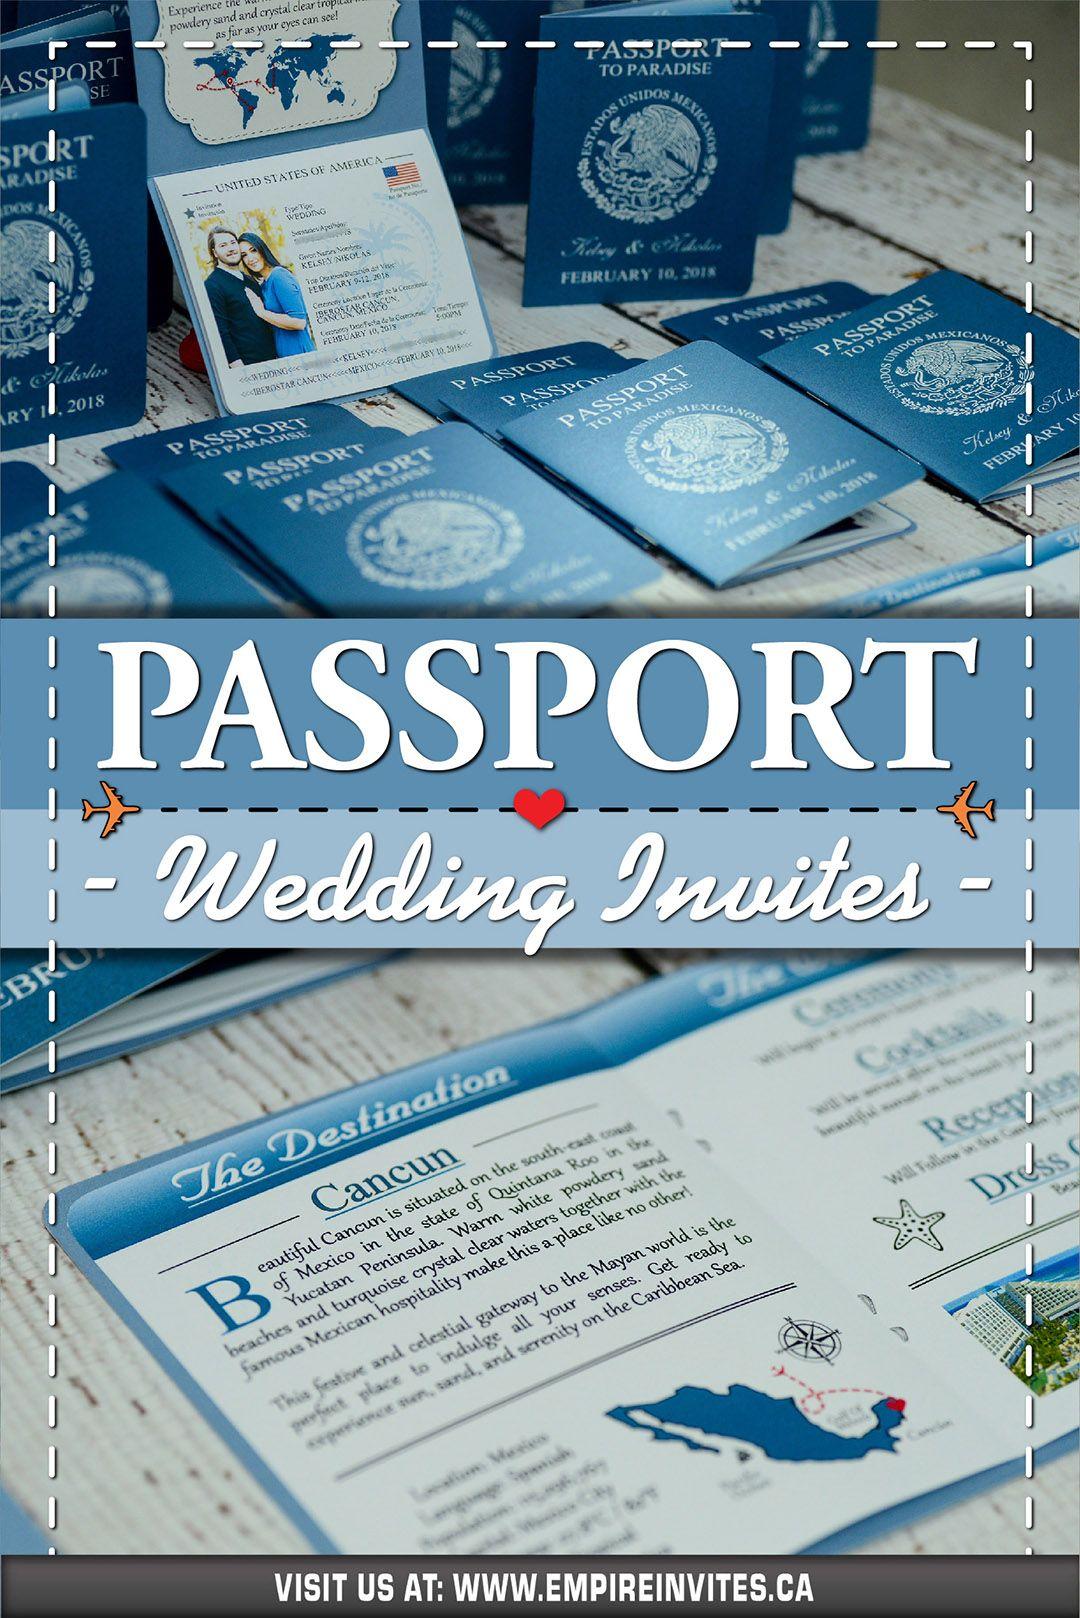 ☀️Blue passport wedding invitations for a destination